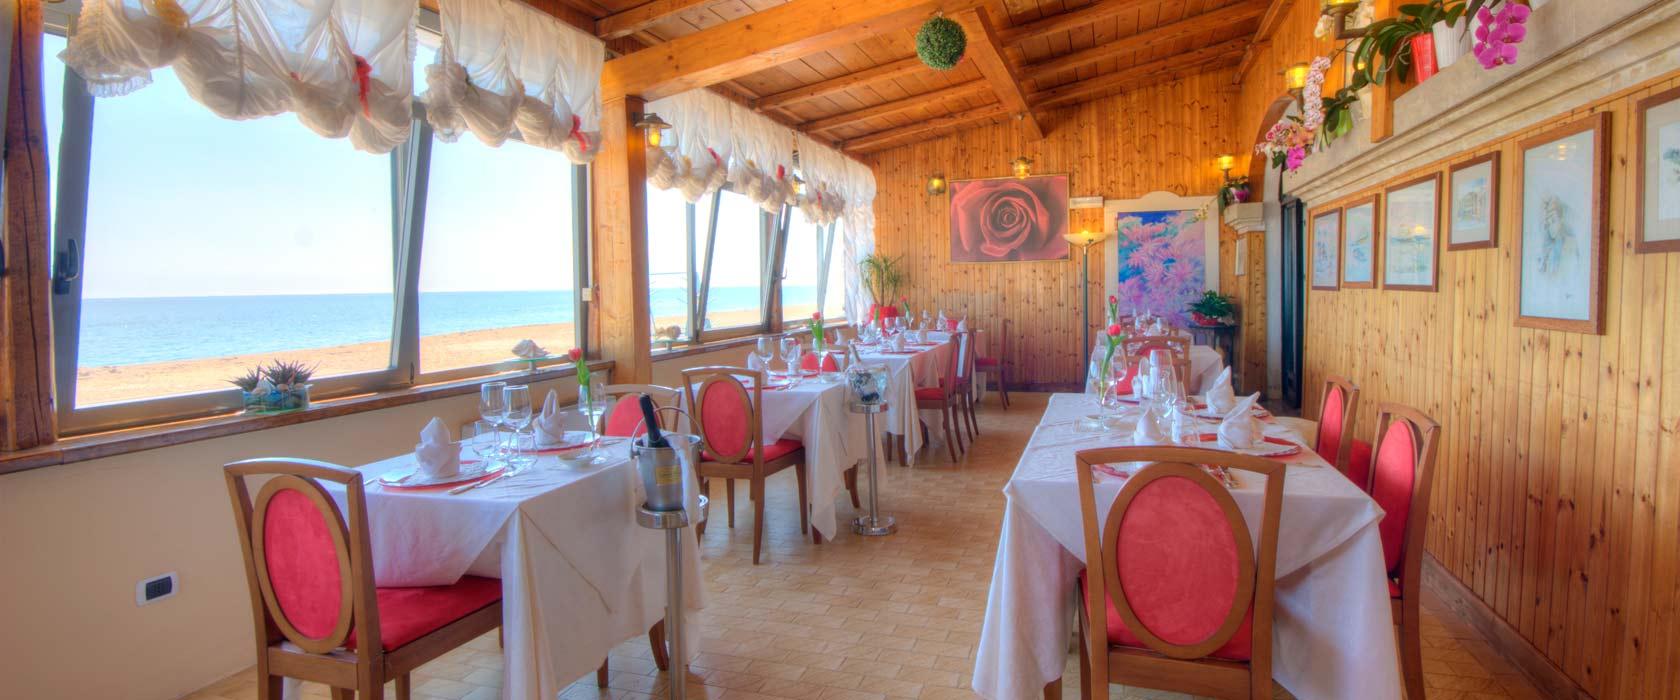 ristorante-numana_002